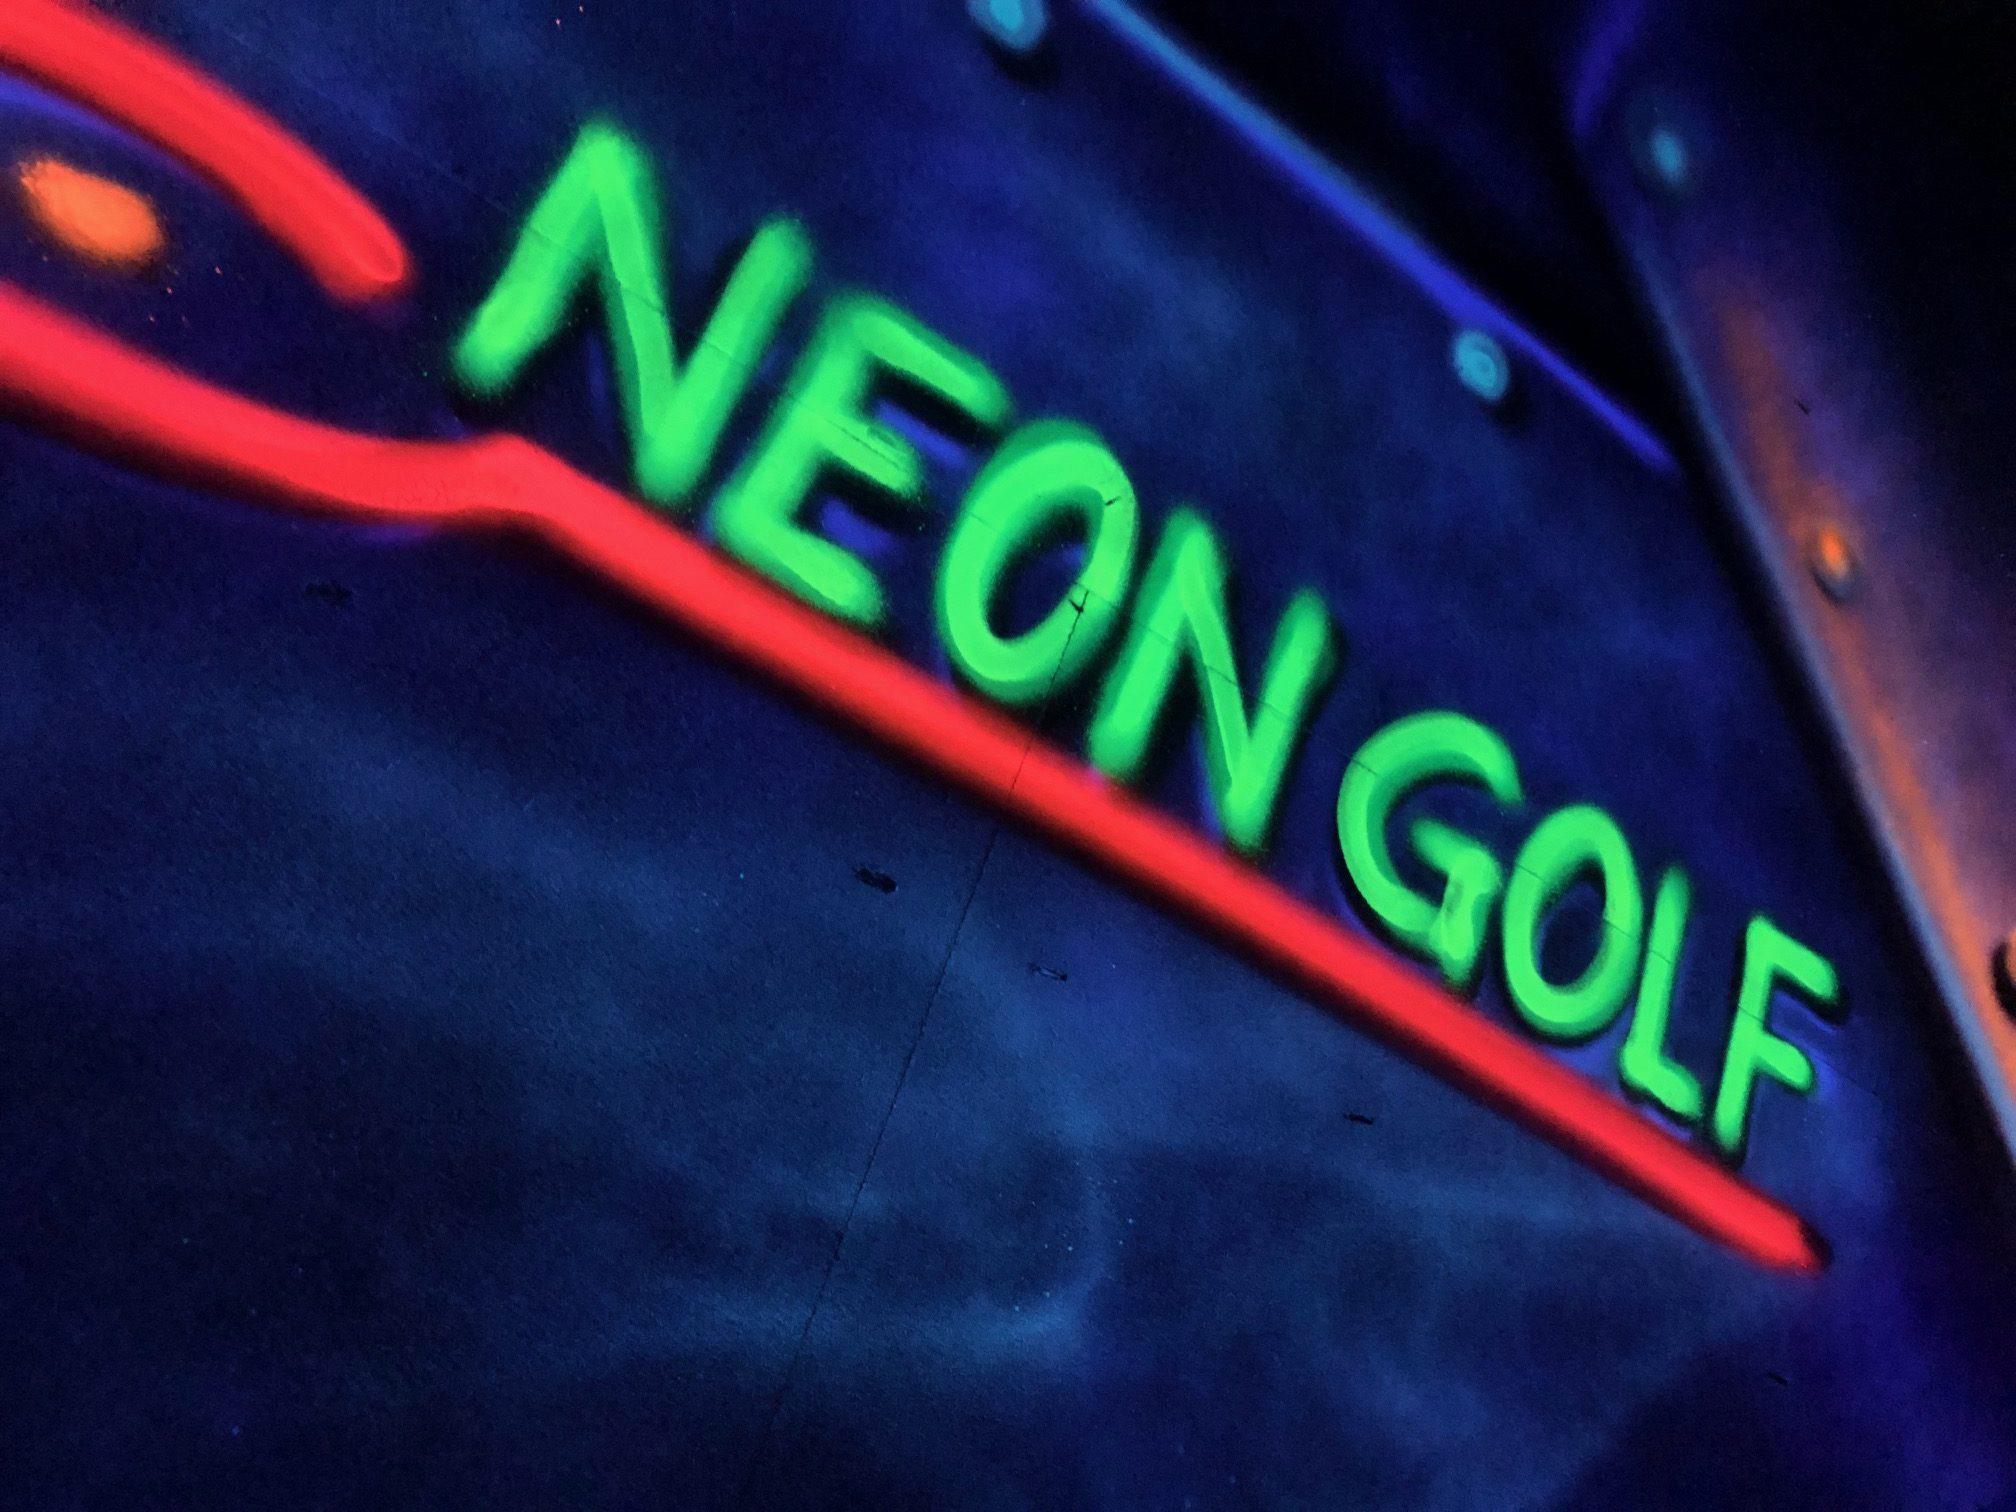 Jugendfeuerwehr Echte spielt Neongolf in Göttingen